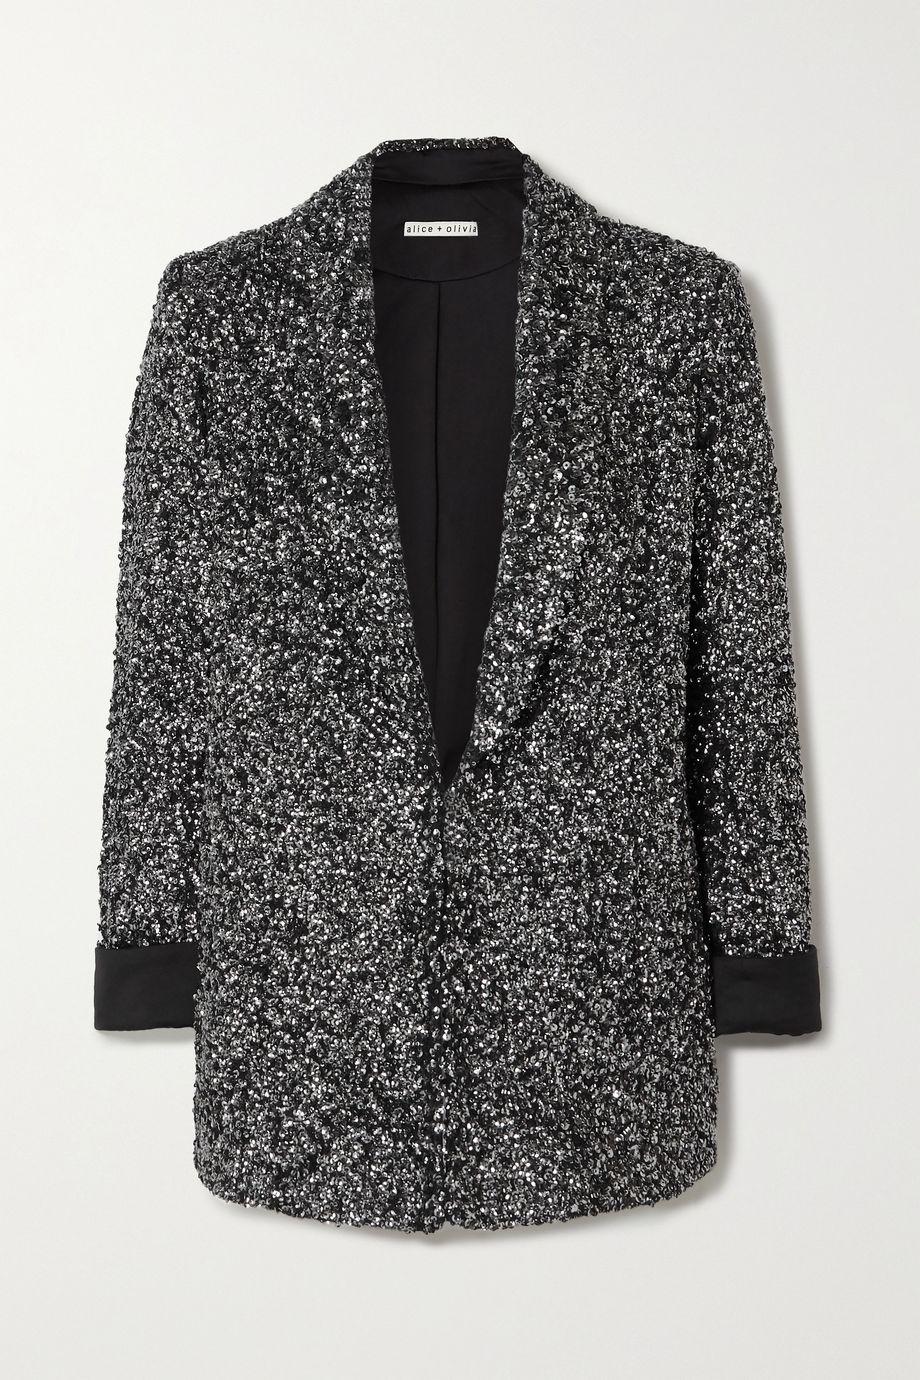 Alice + Olivia Jace sequined silk-satin blazer